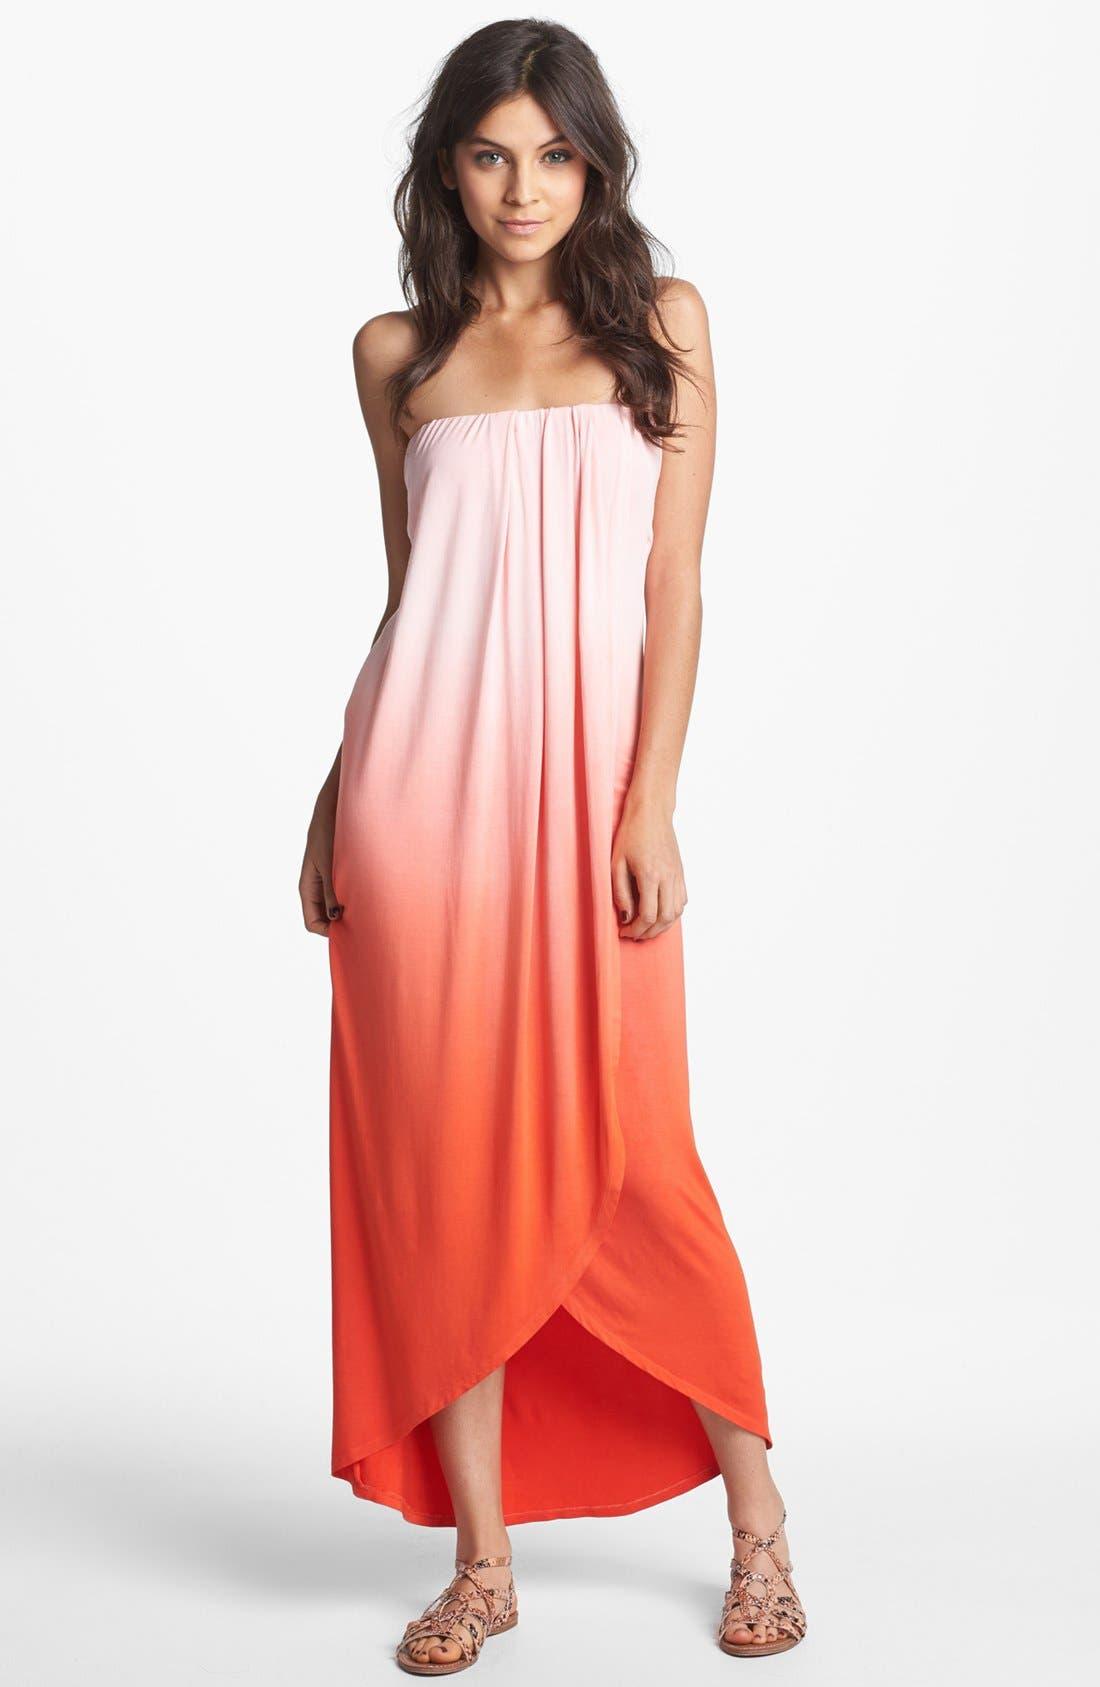 Main Image - Young, Fabulous & Broke 'Brooklyn' Ombré Maxi Dress